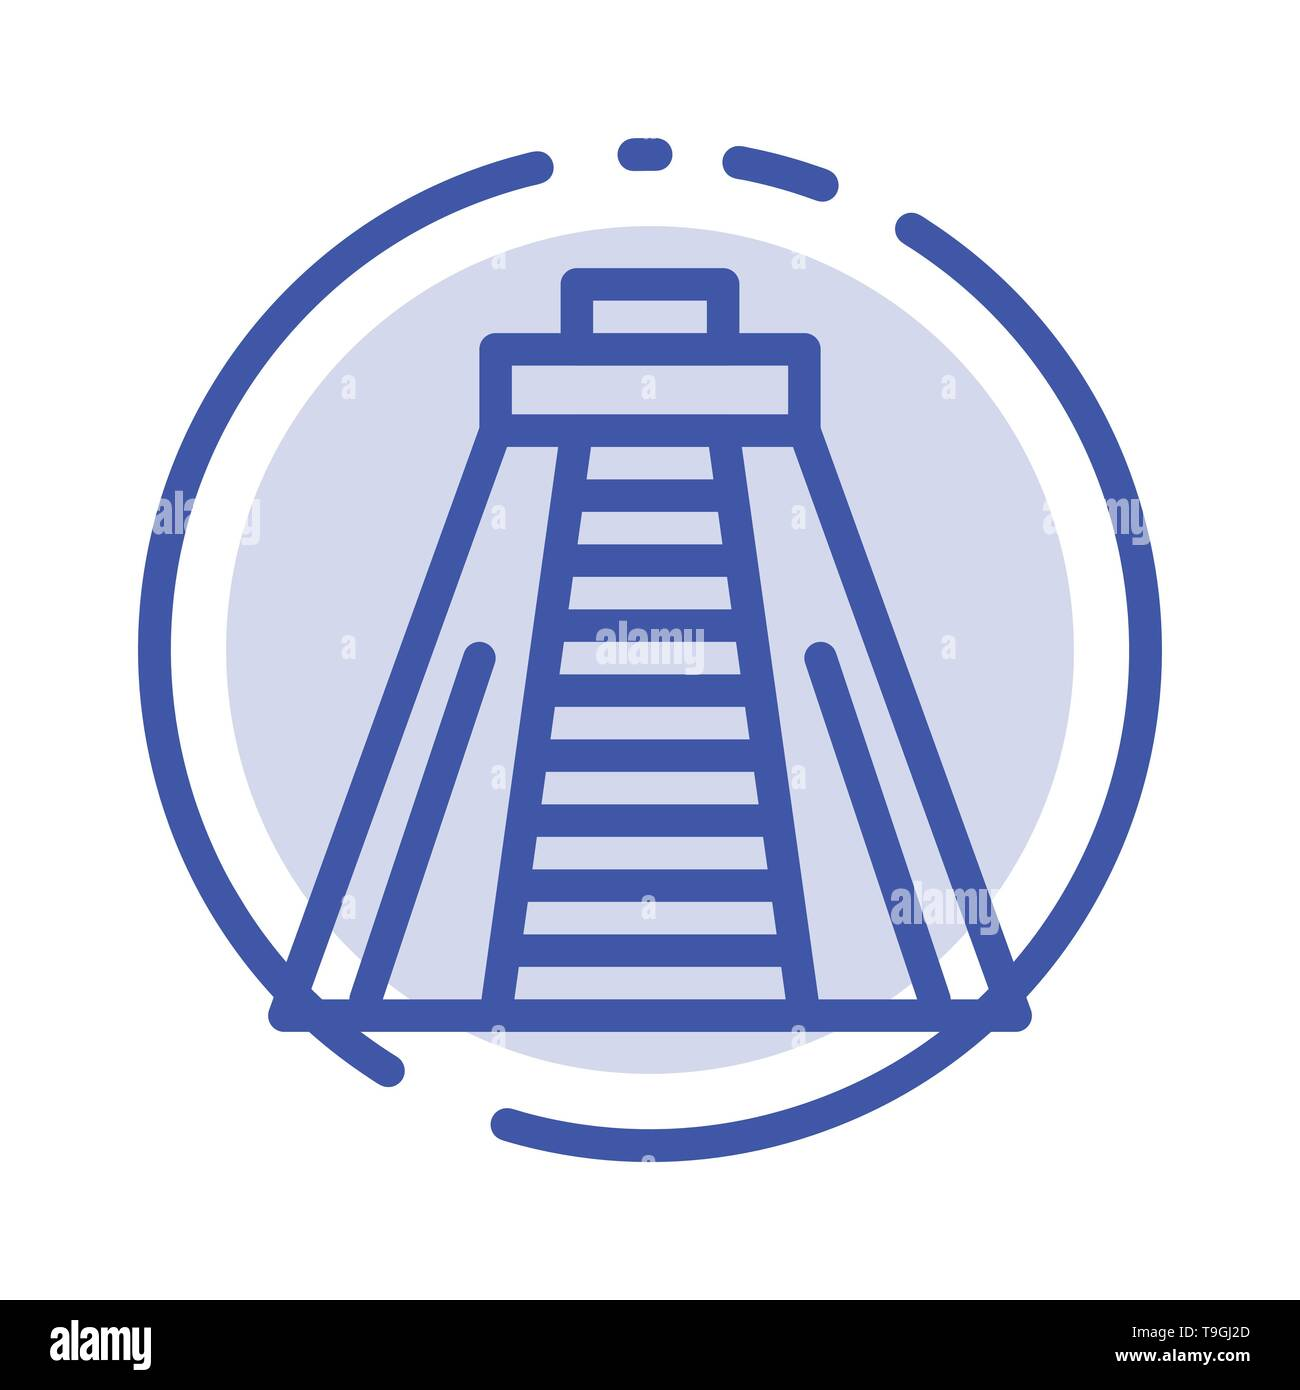 Chichen Itza, Landmark, Monument Blue Dotted Line Line Icon - Stock Image